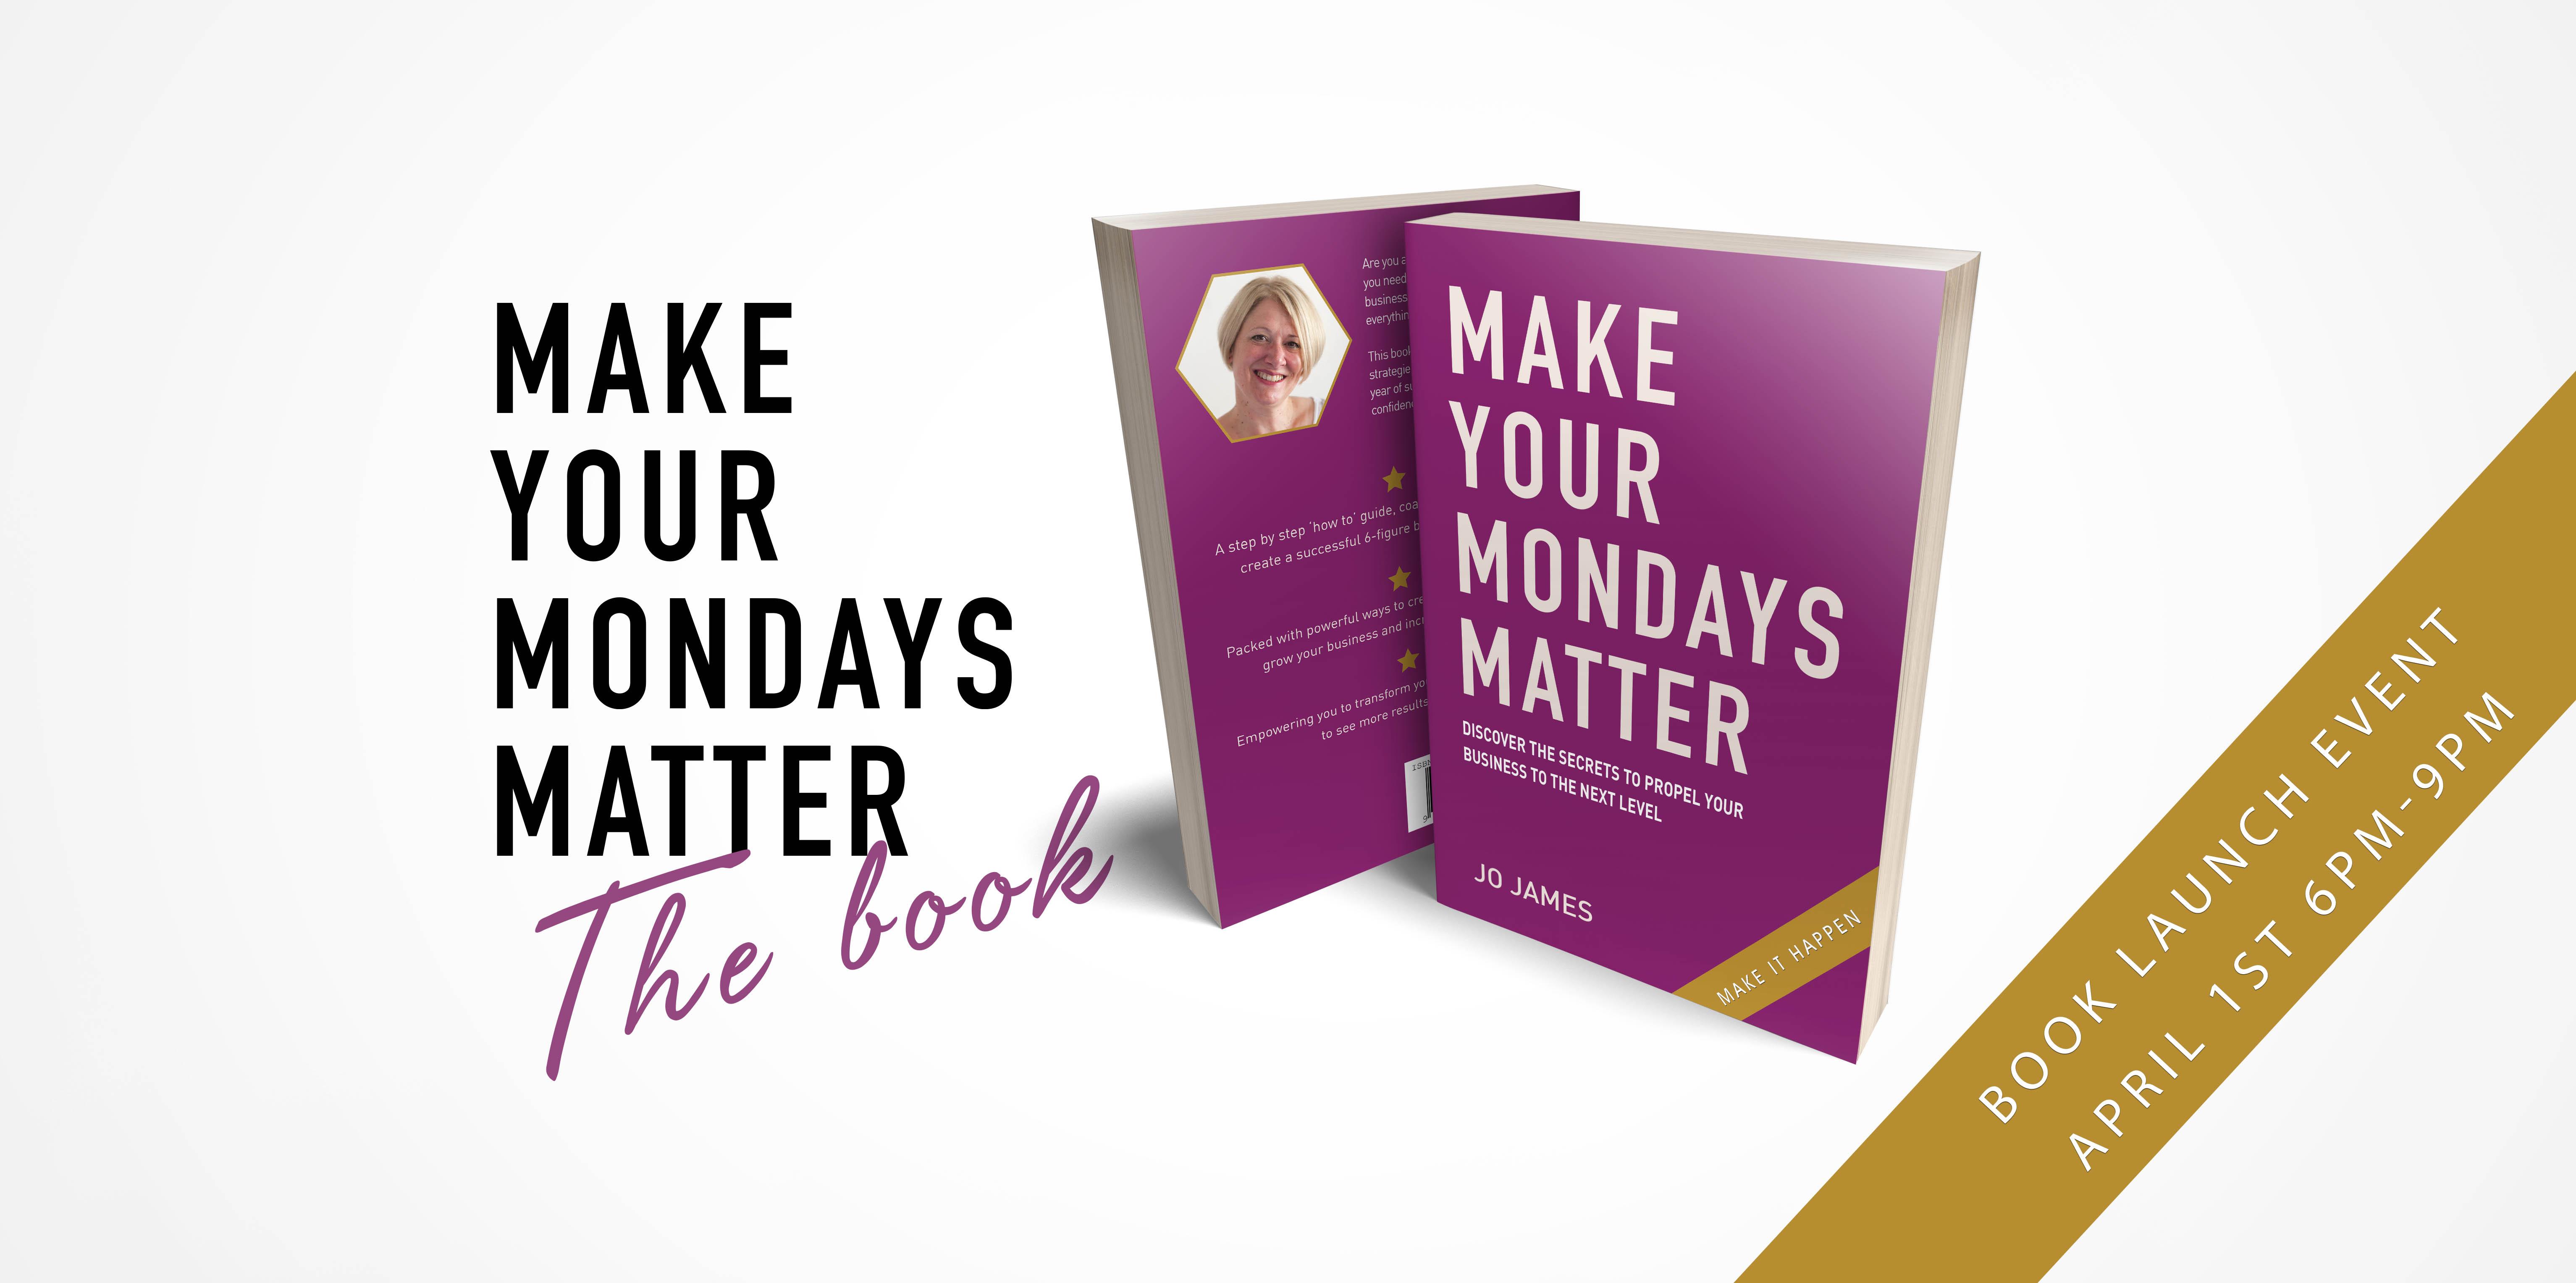 Make Your Mondays Matter Book Launch Event April 1st